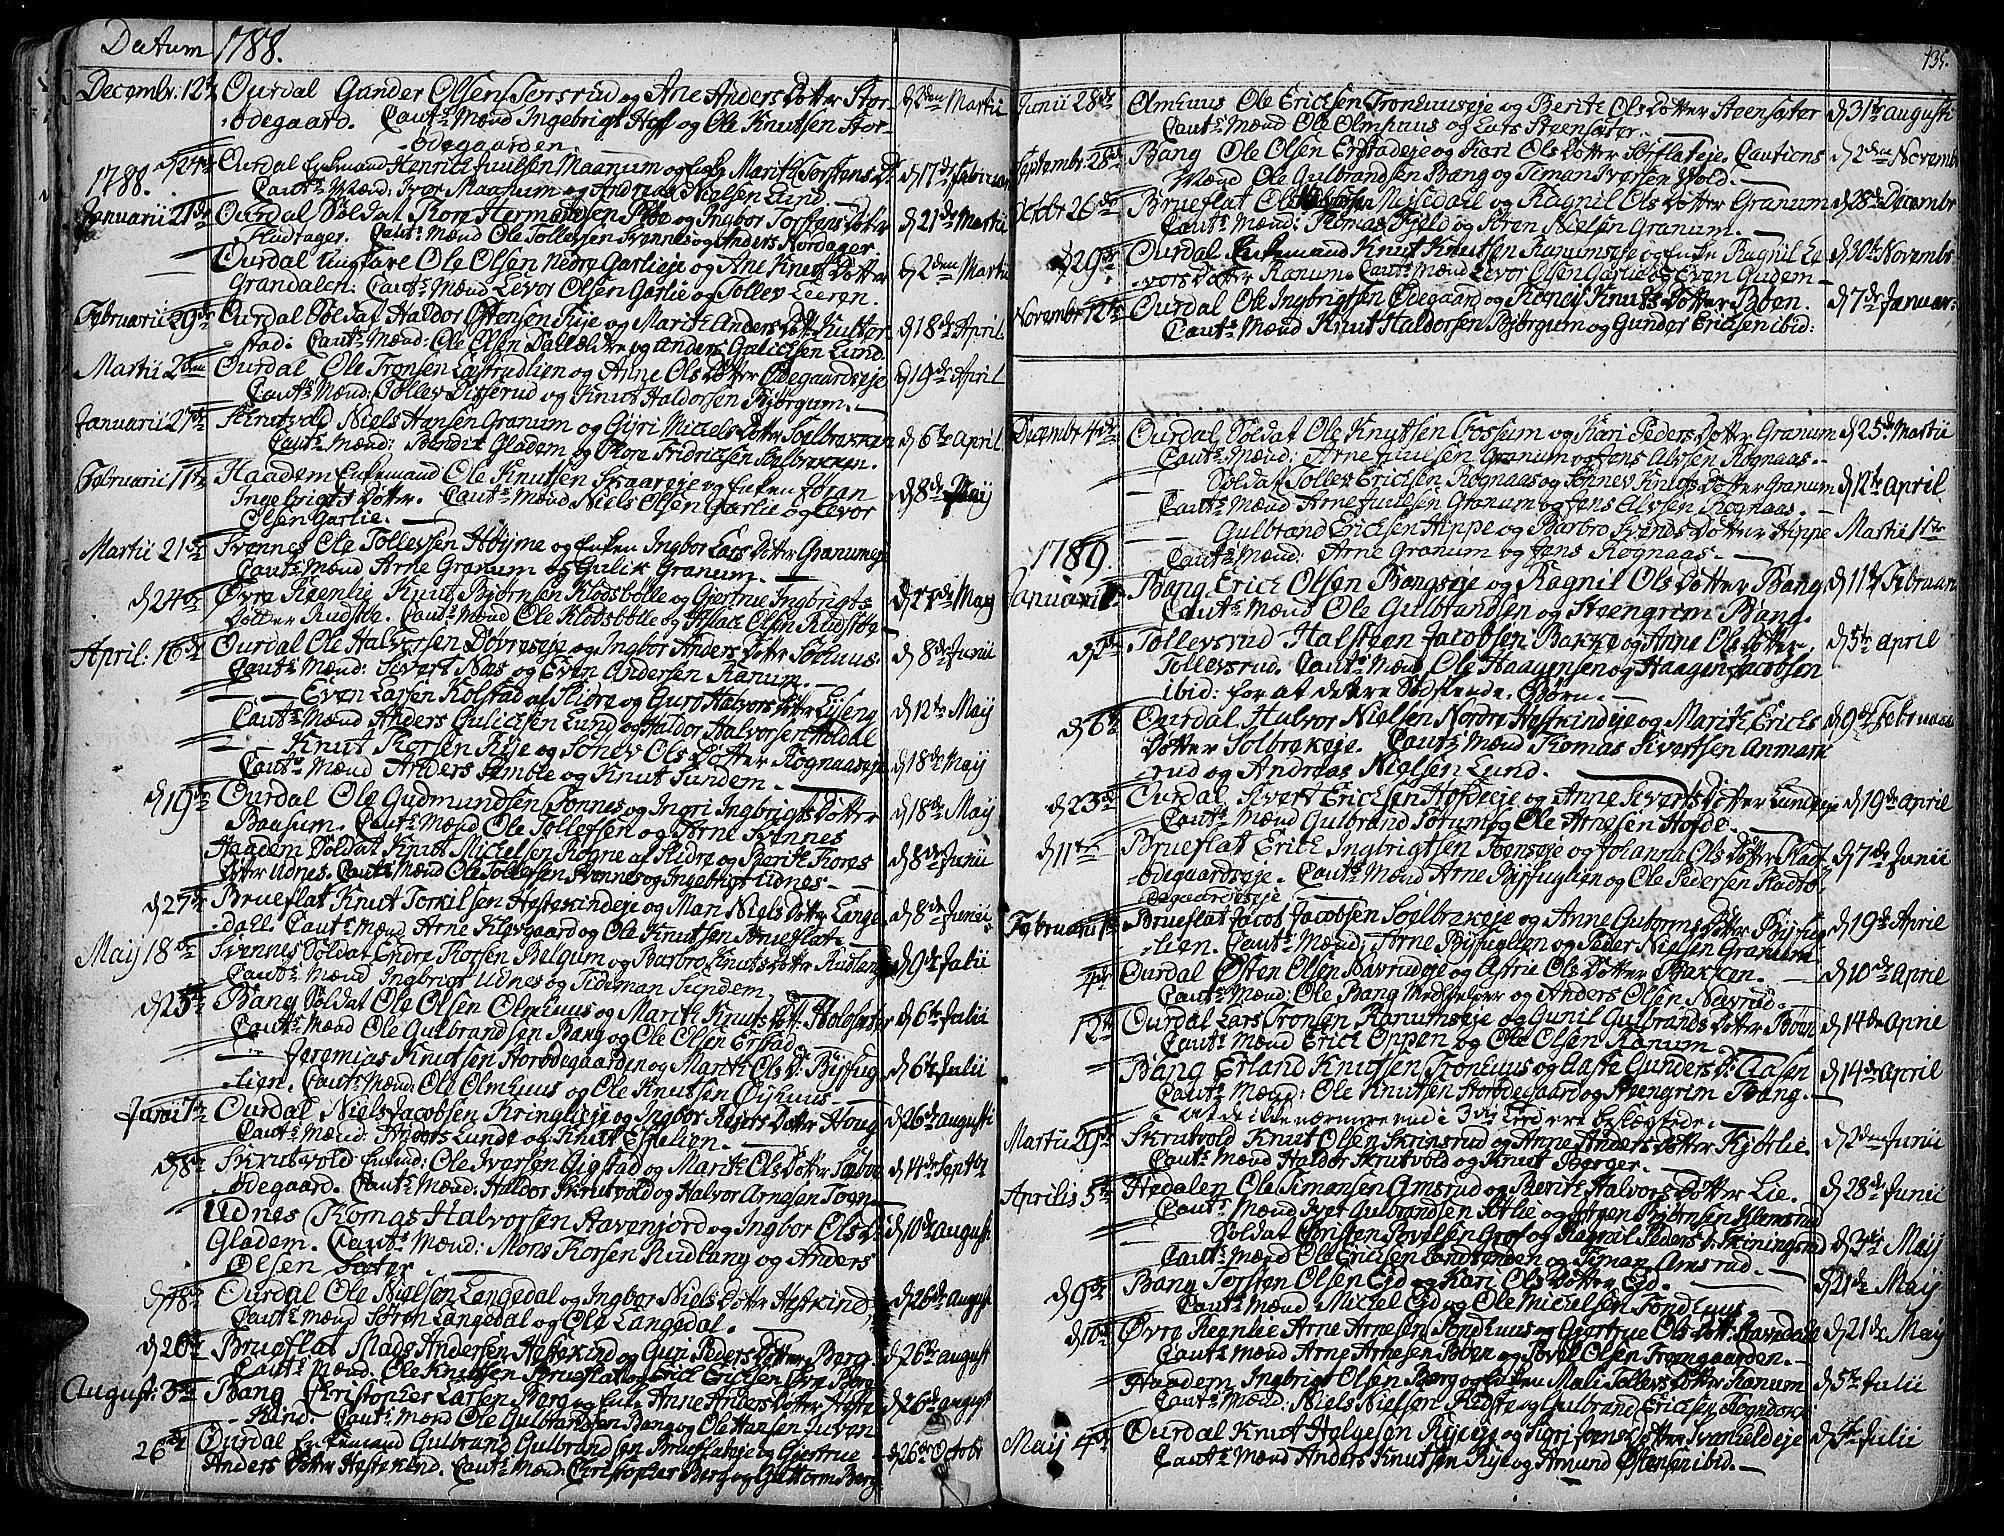 SAH, Aurdal prestekontor, Ministerialbok nr. 6, 1781-1804, s. 135